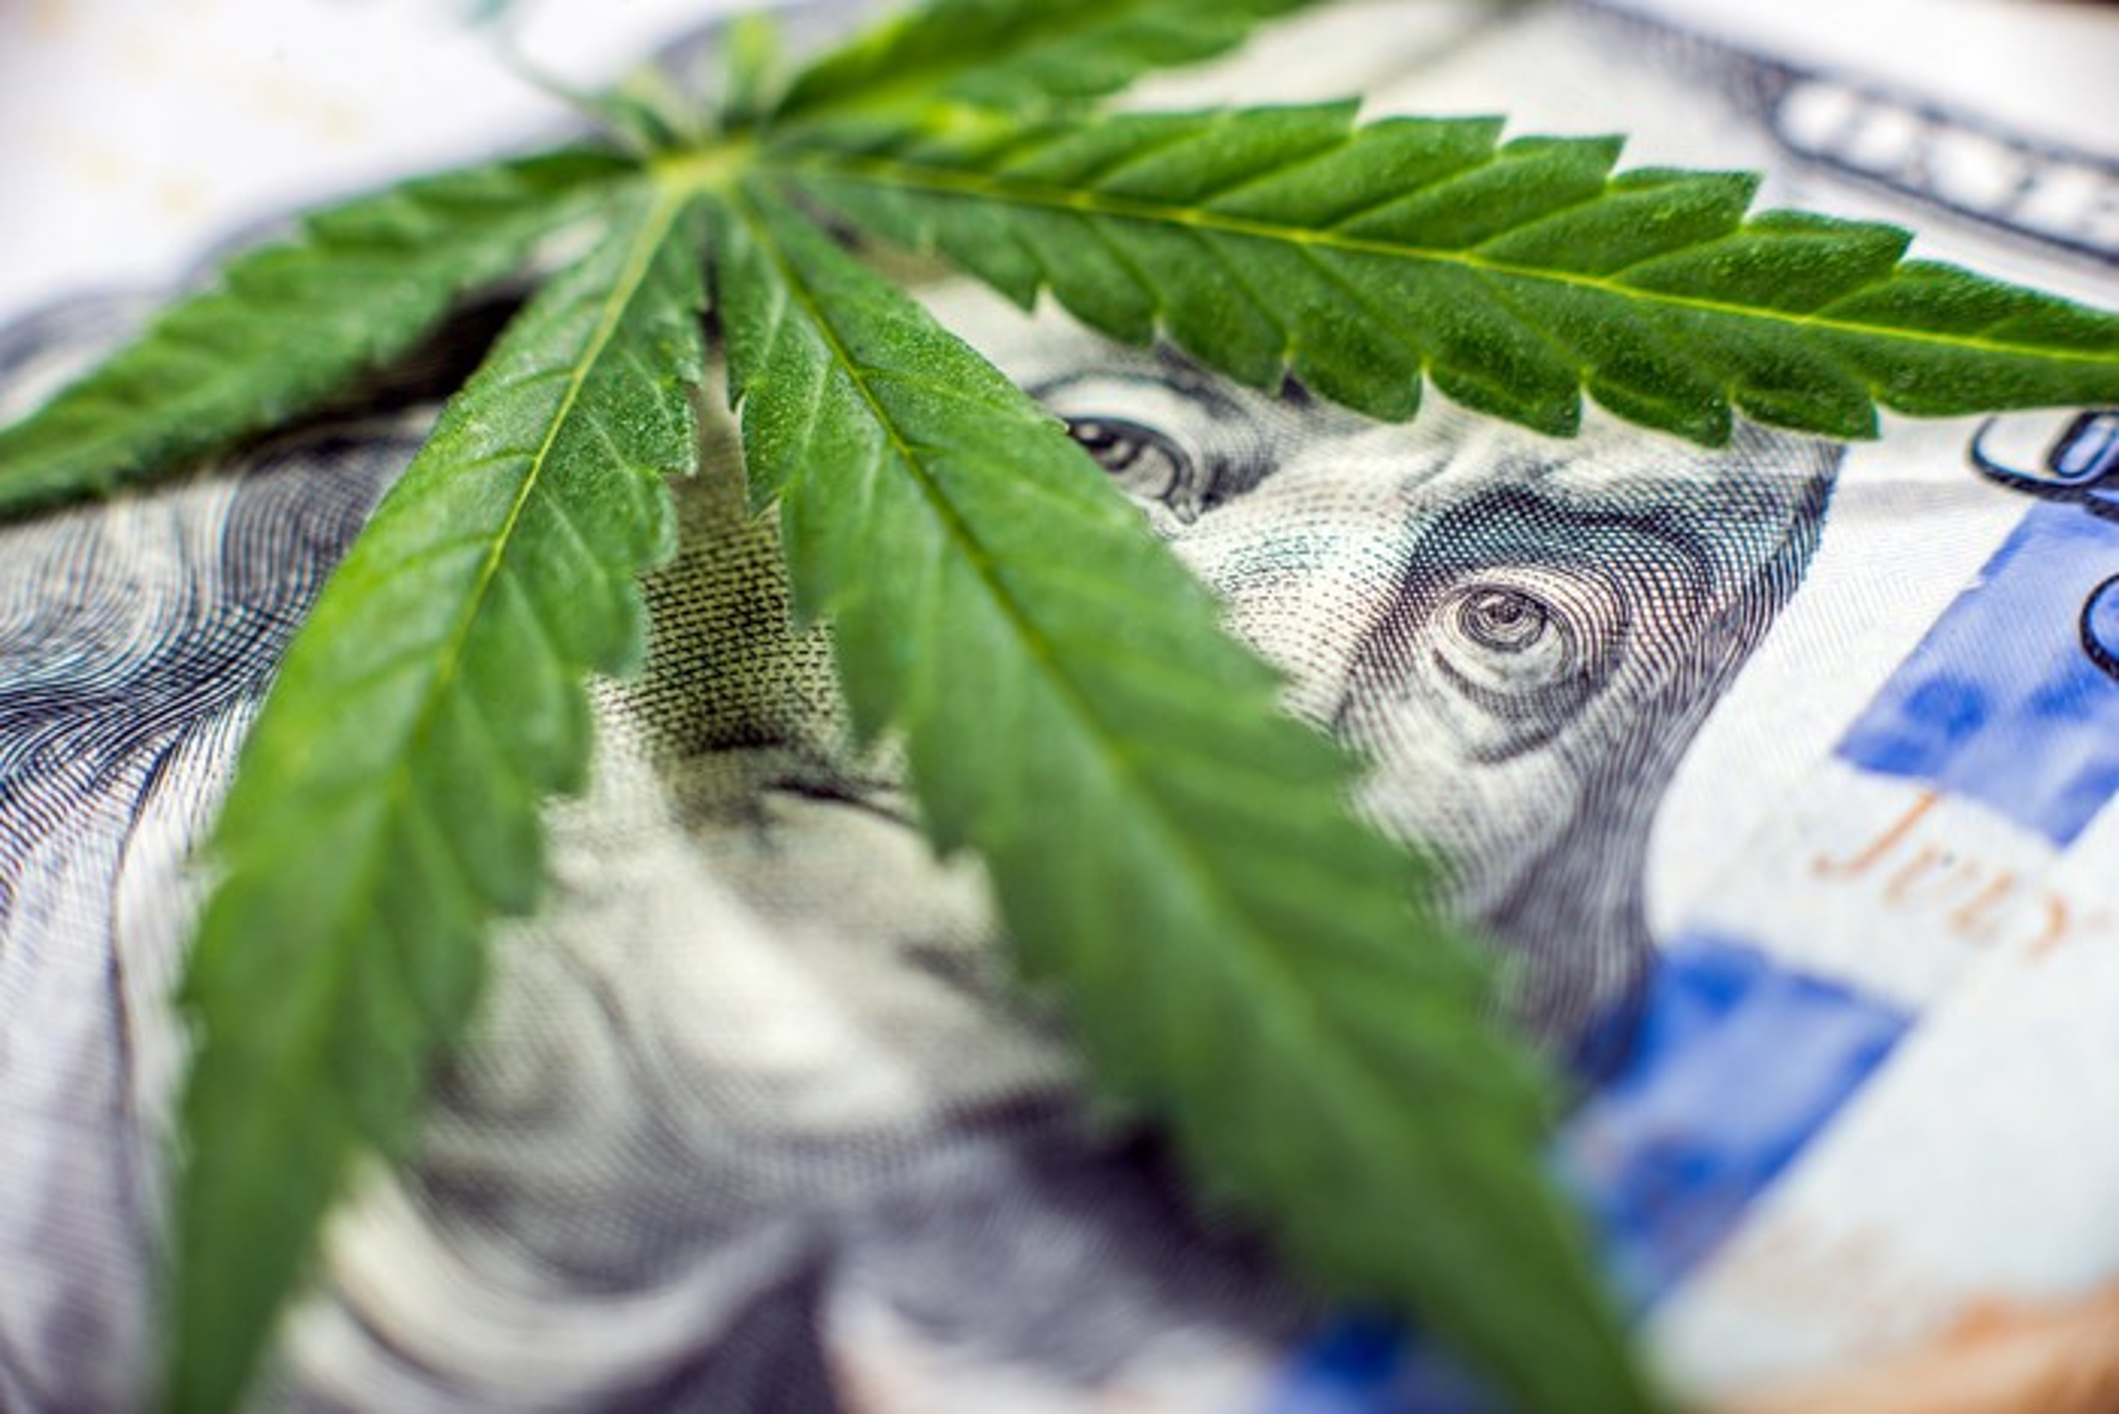 Marijuana leaf on top of Ben Franklin's face on a $100 bill